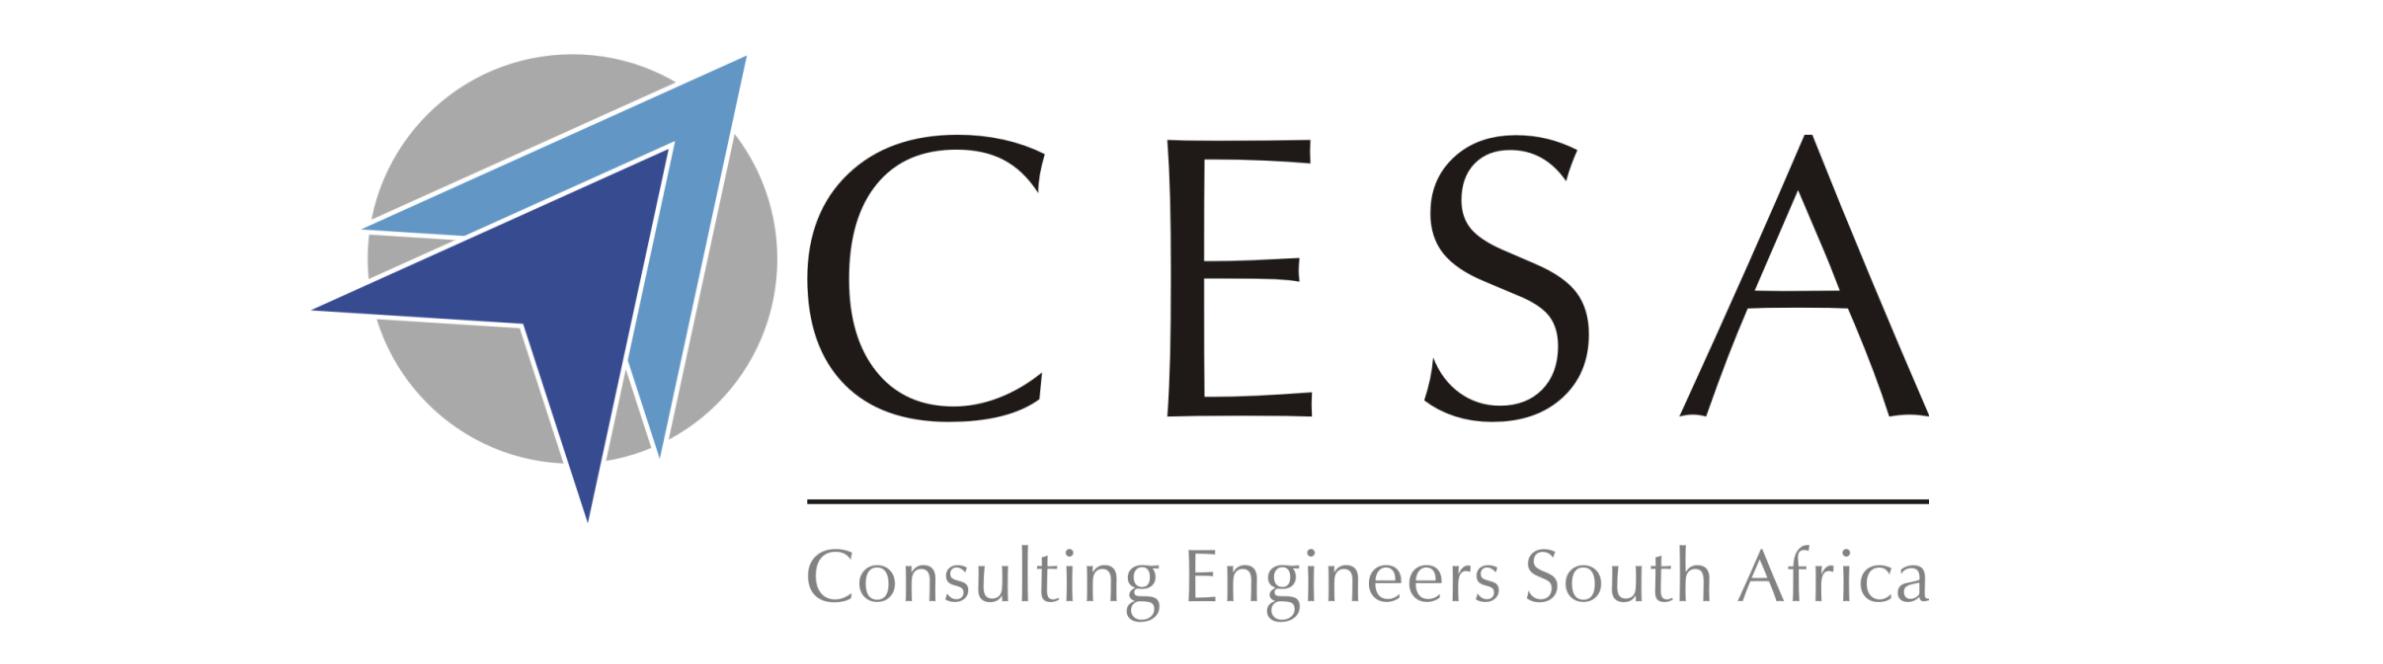 cesa-logo-large CROP.png